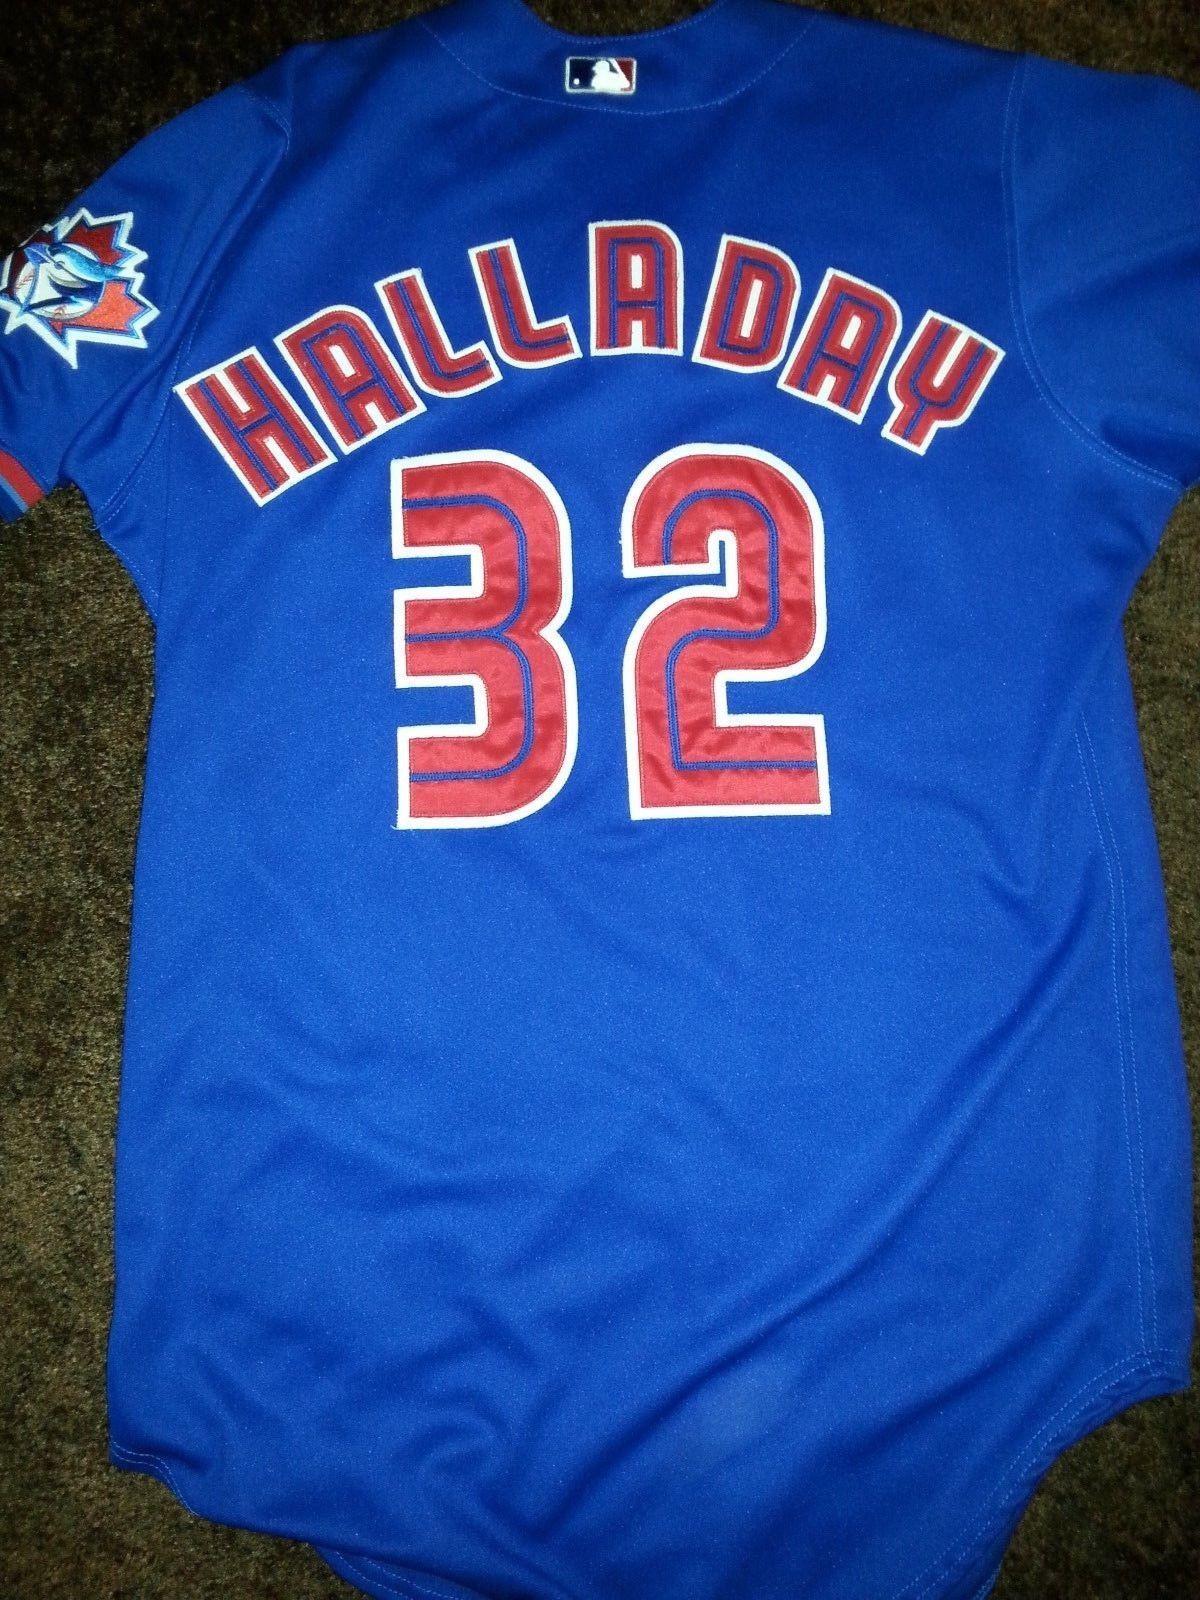 7accf59267e Roy Halladay 2000 Toronto Blue Jays Game Used Jersey